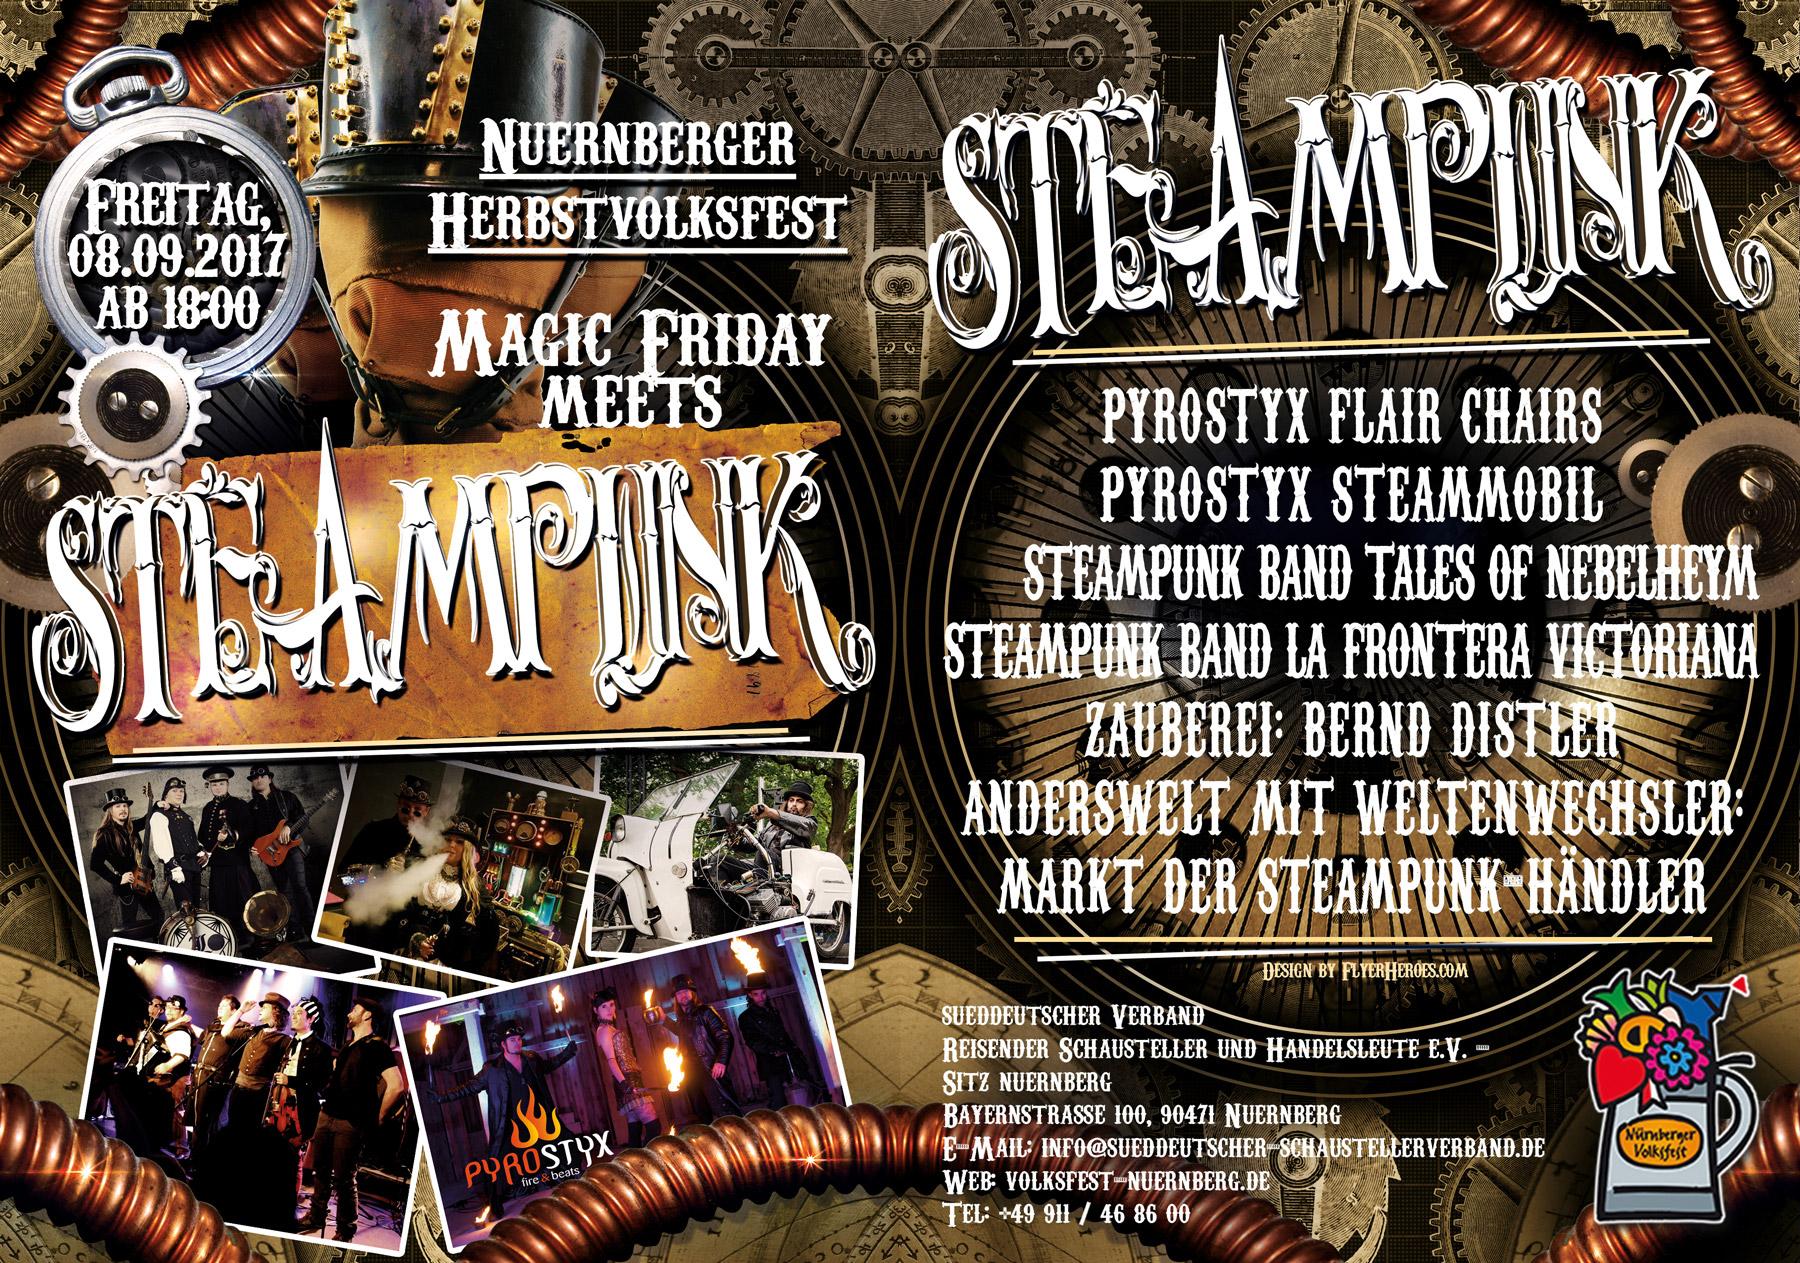 http://mediadb.nordbayern.de/live/volksfest/programm/Steampunk_programm_2017.jpg